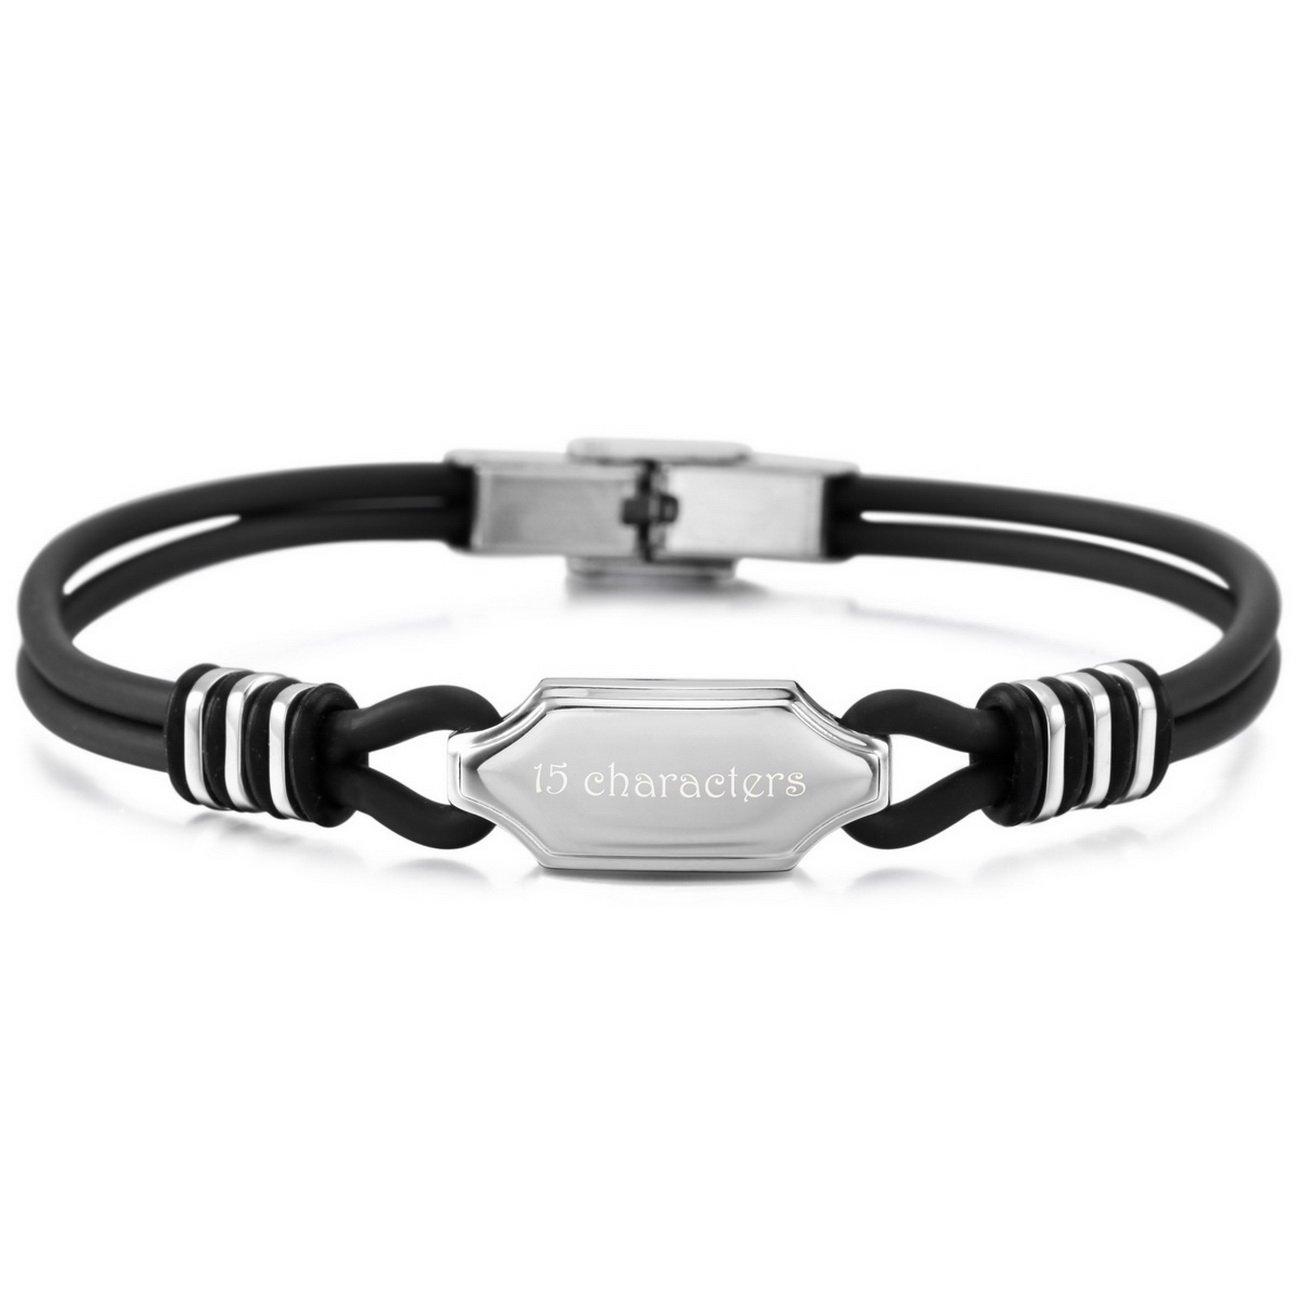 MeMeDIY Black Silver Tone Stainless Steel Genuine Leather Bracelet Bangle Customized Engraving